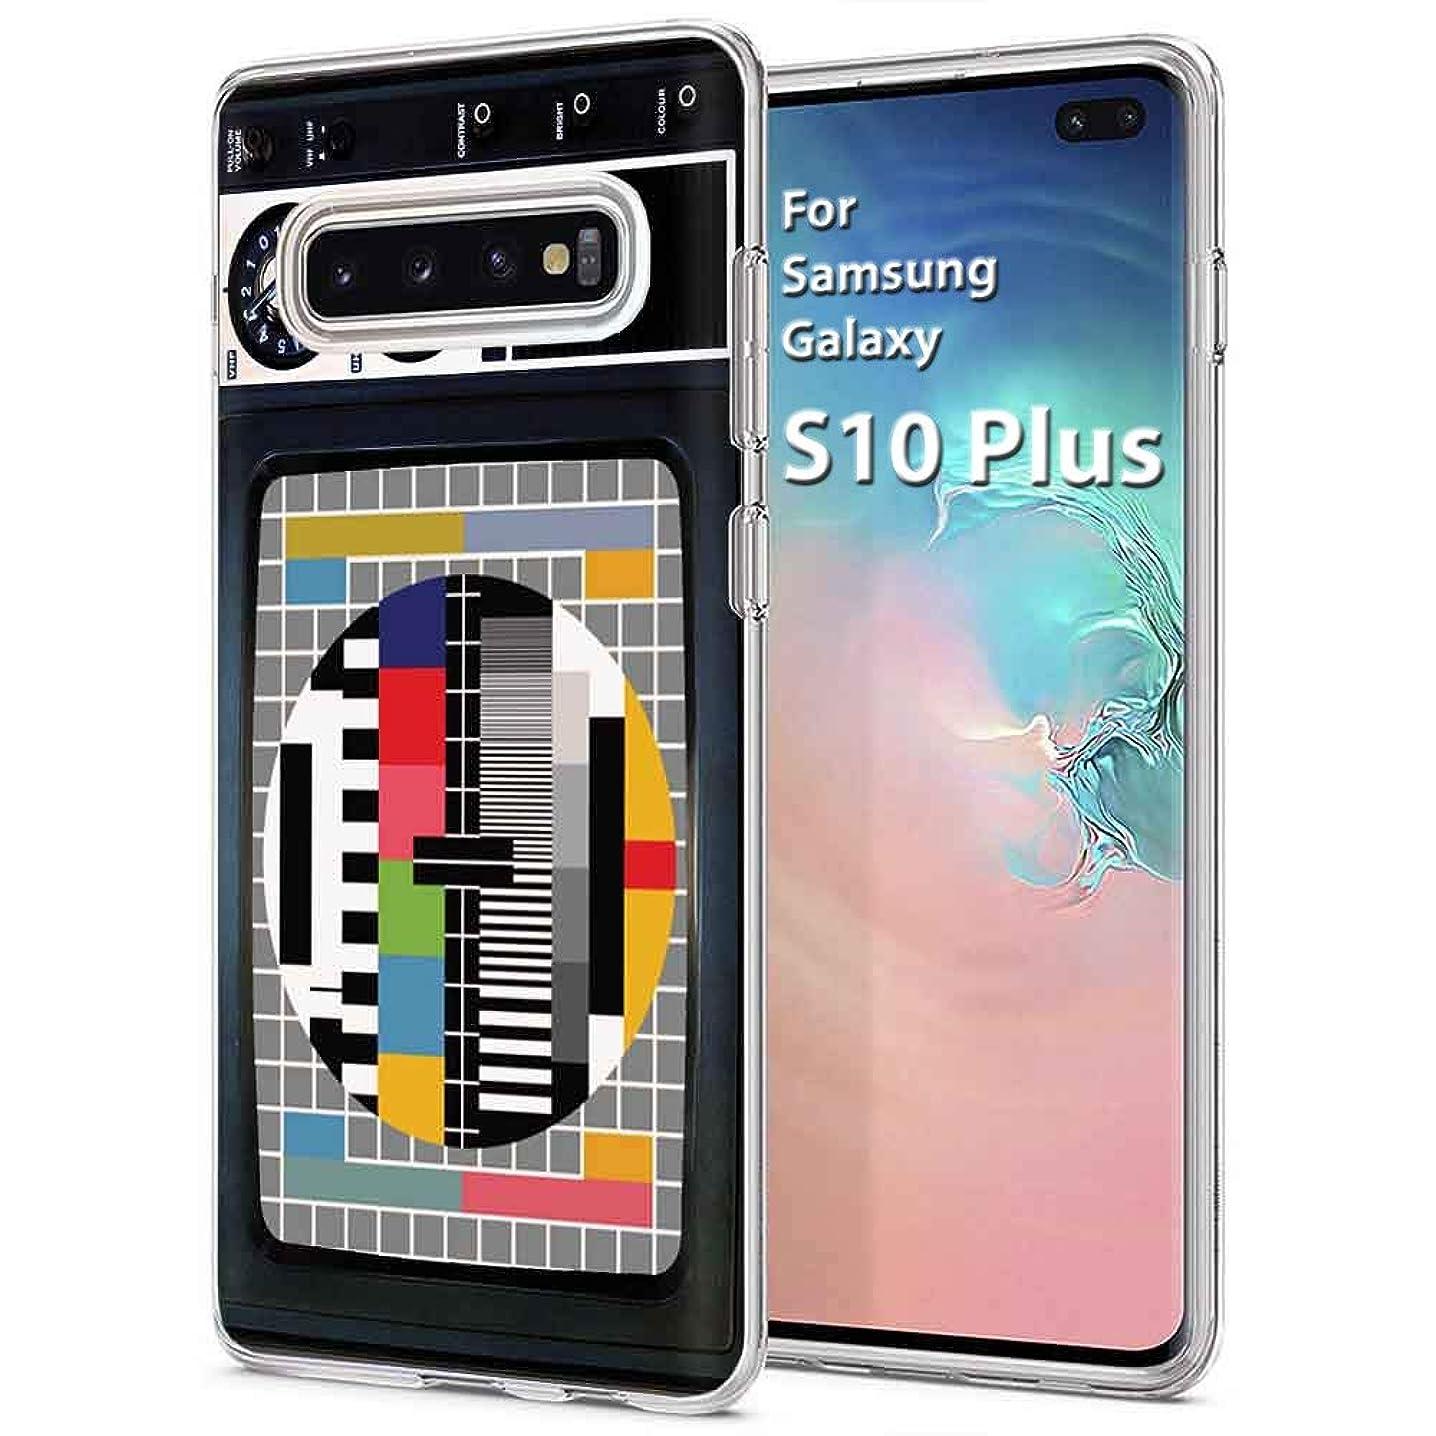 [Naked Shield] Samsung Galaxy S10 Plus [Clear] Slim Flex Gel Skin Case Feature Light Weight, Enhanced Grip Design TPU Case for Samsung SM-G975 [Retro TV Print], Designed in USA